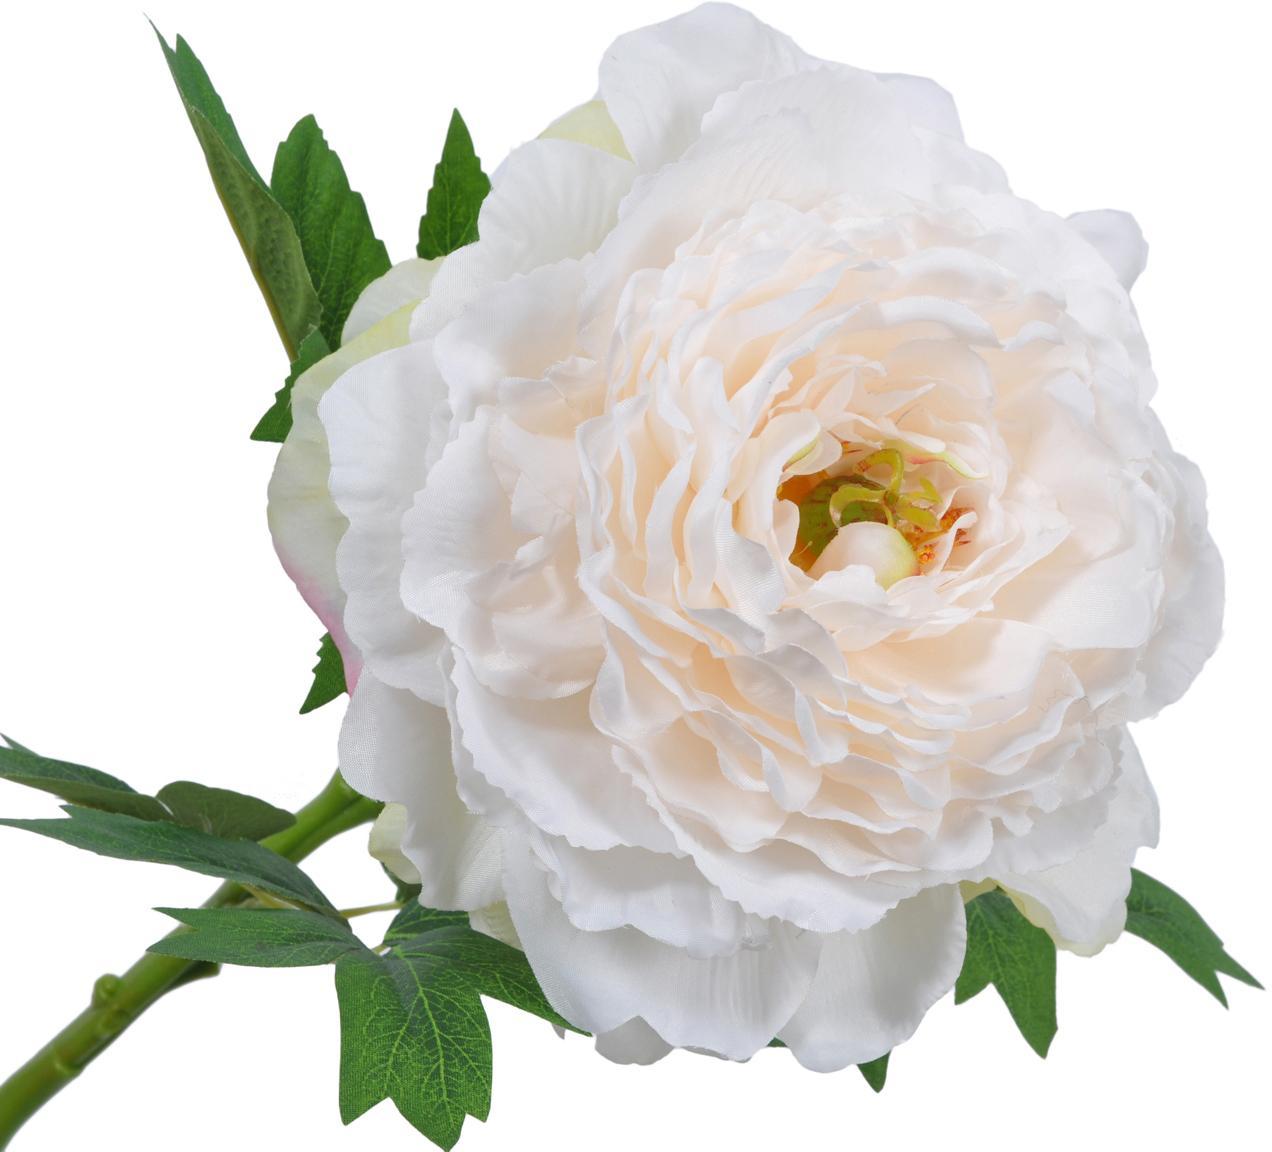 Kunstblume Pfingstrose Enia, Blüte: Kunststoff, Stiel: Metall, Cremeweiß, L 61 cm